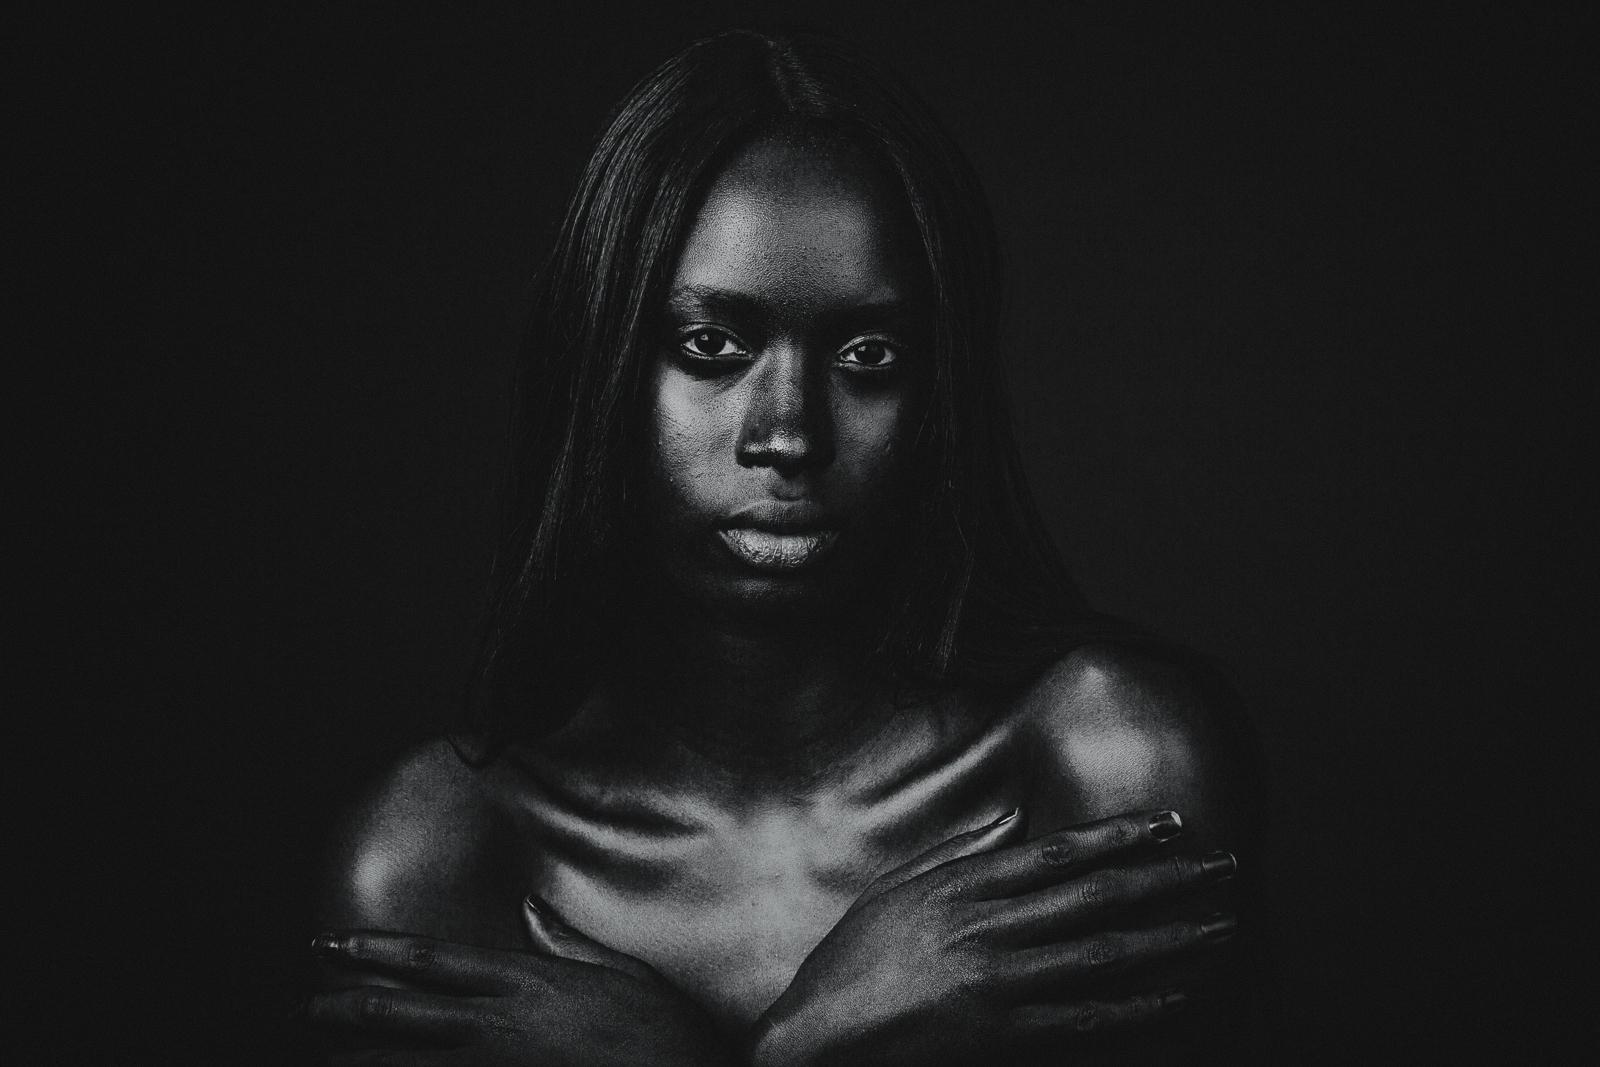 "Studio portrait session ""Black on Black"" with model Nya. Photo by Flavio Scorsato"